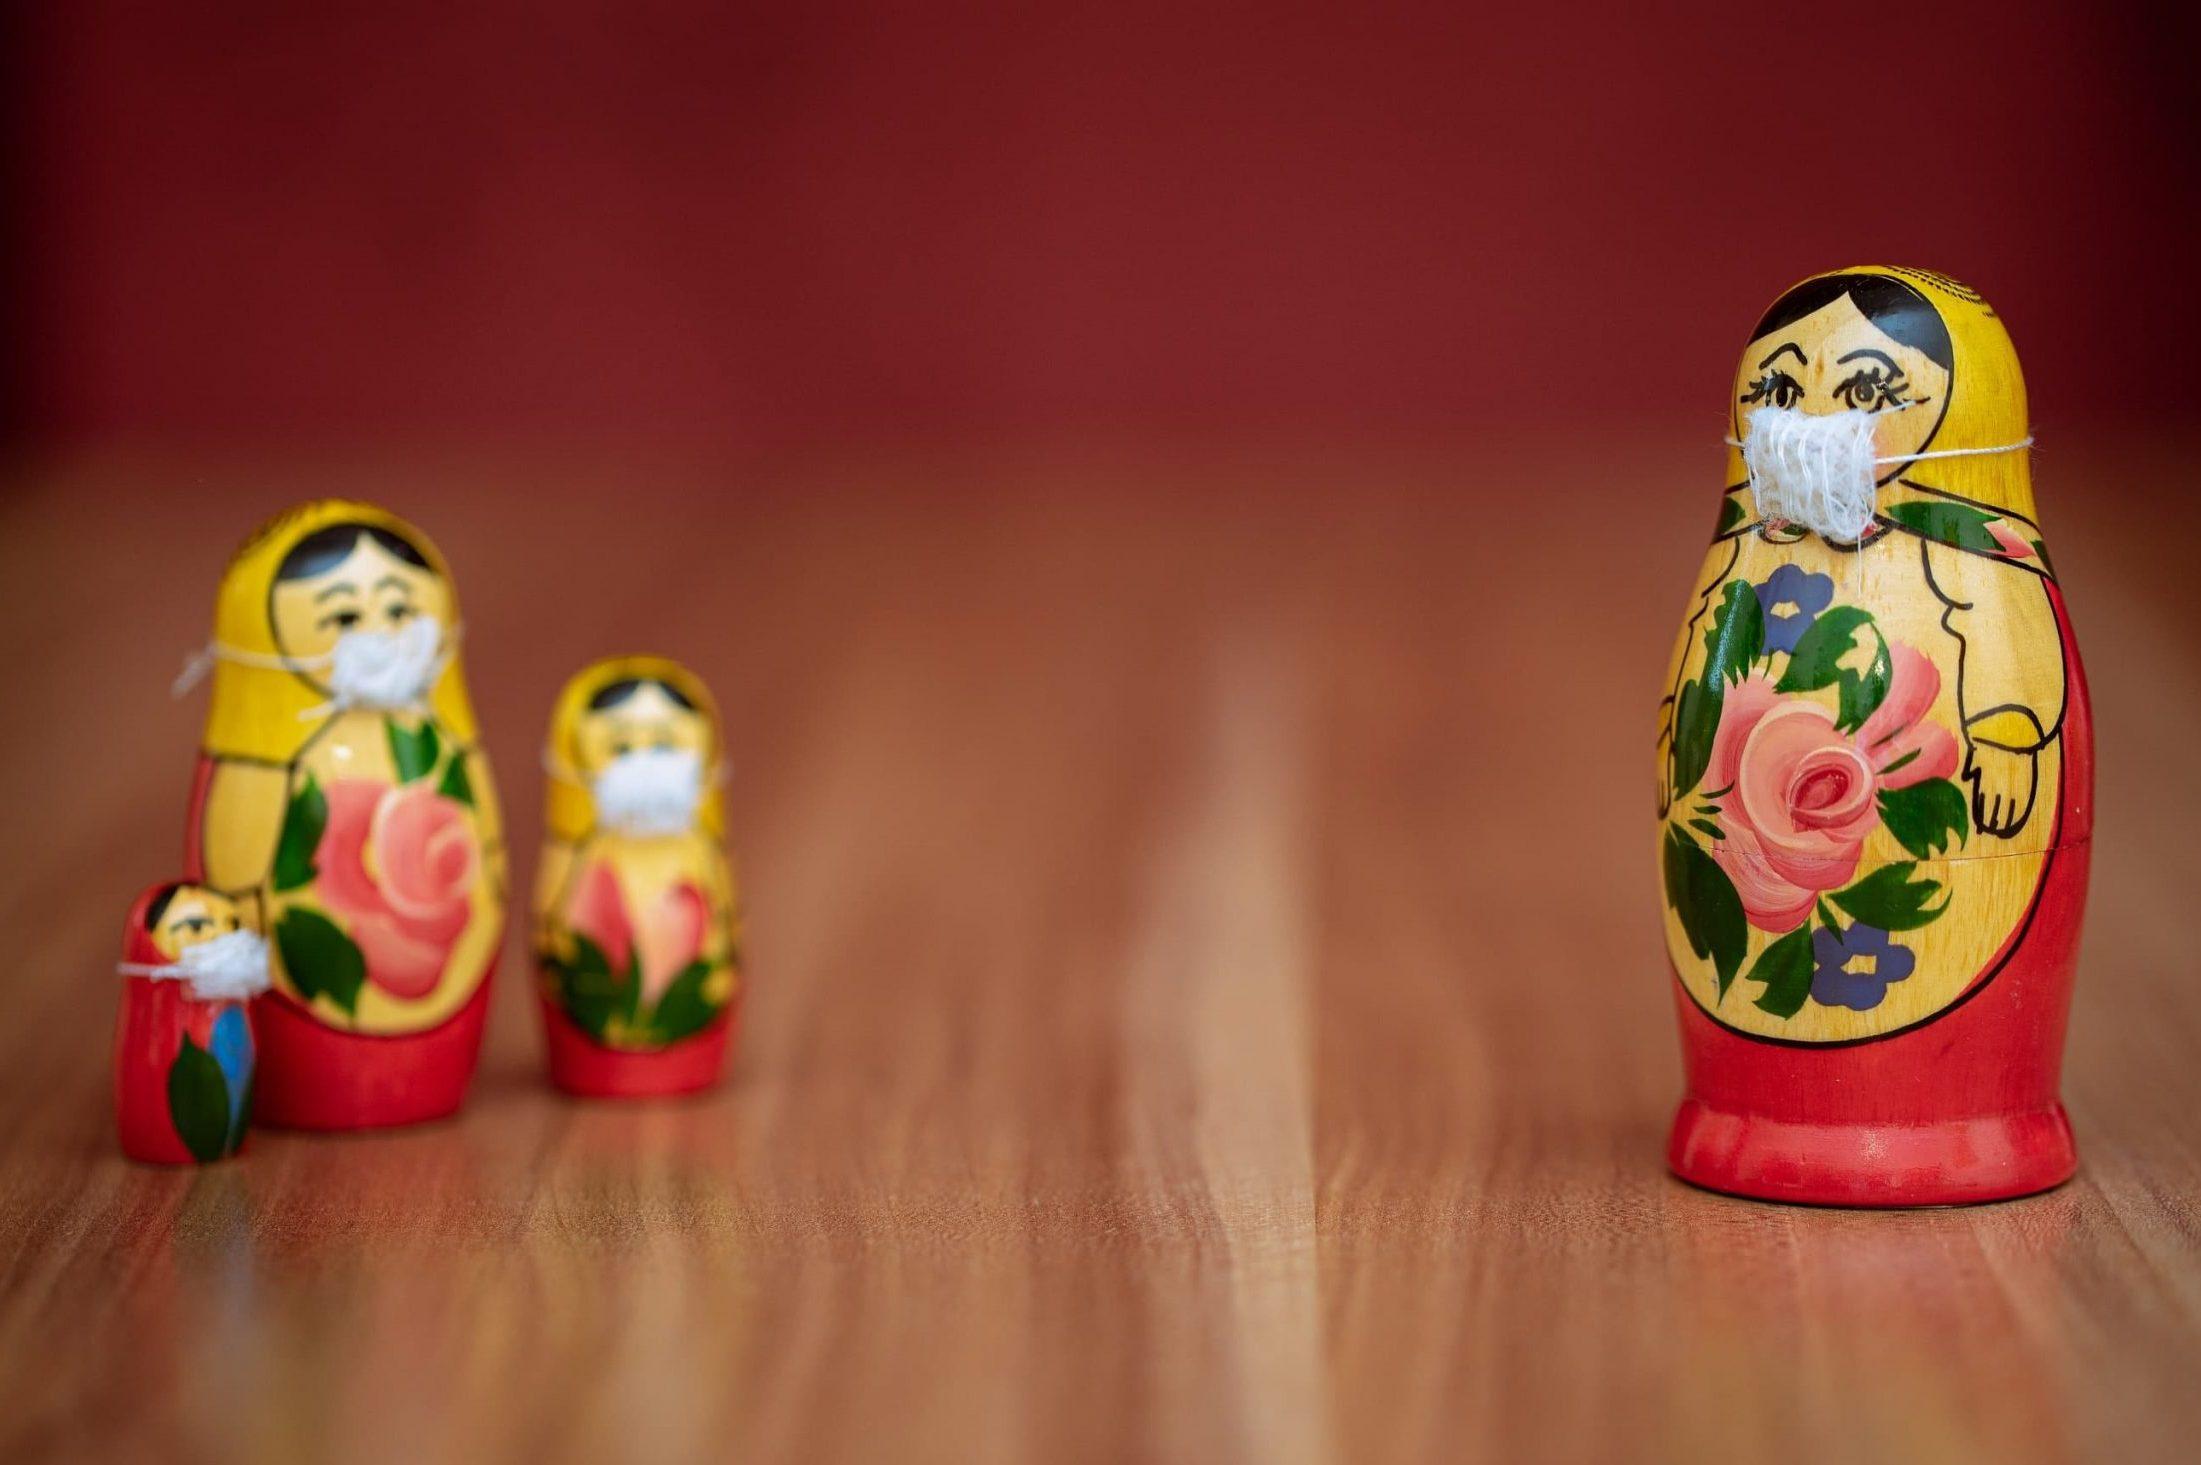 Socially distanced russian dolls wearing masks